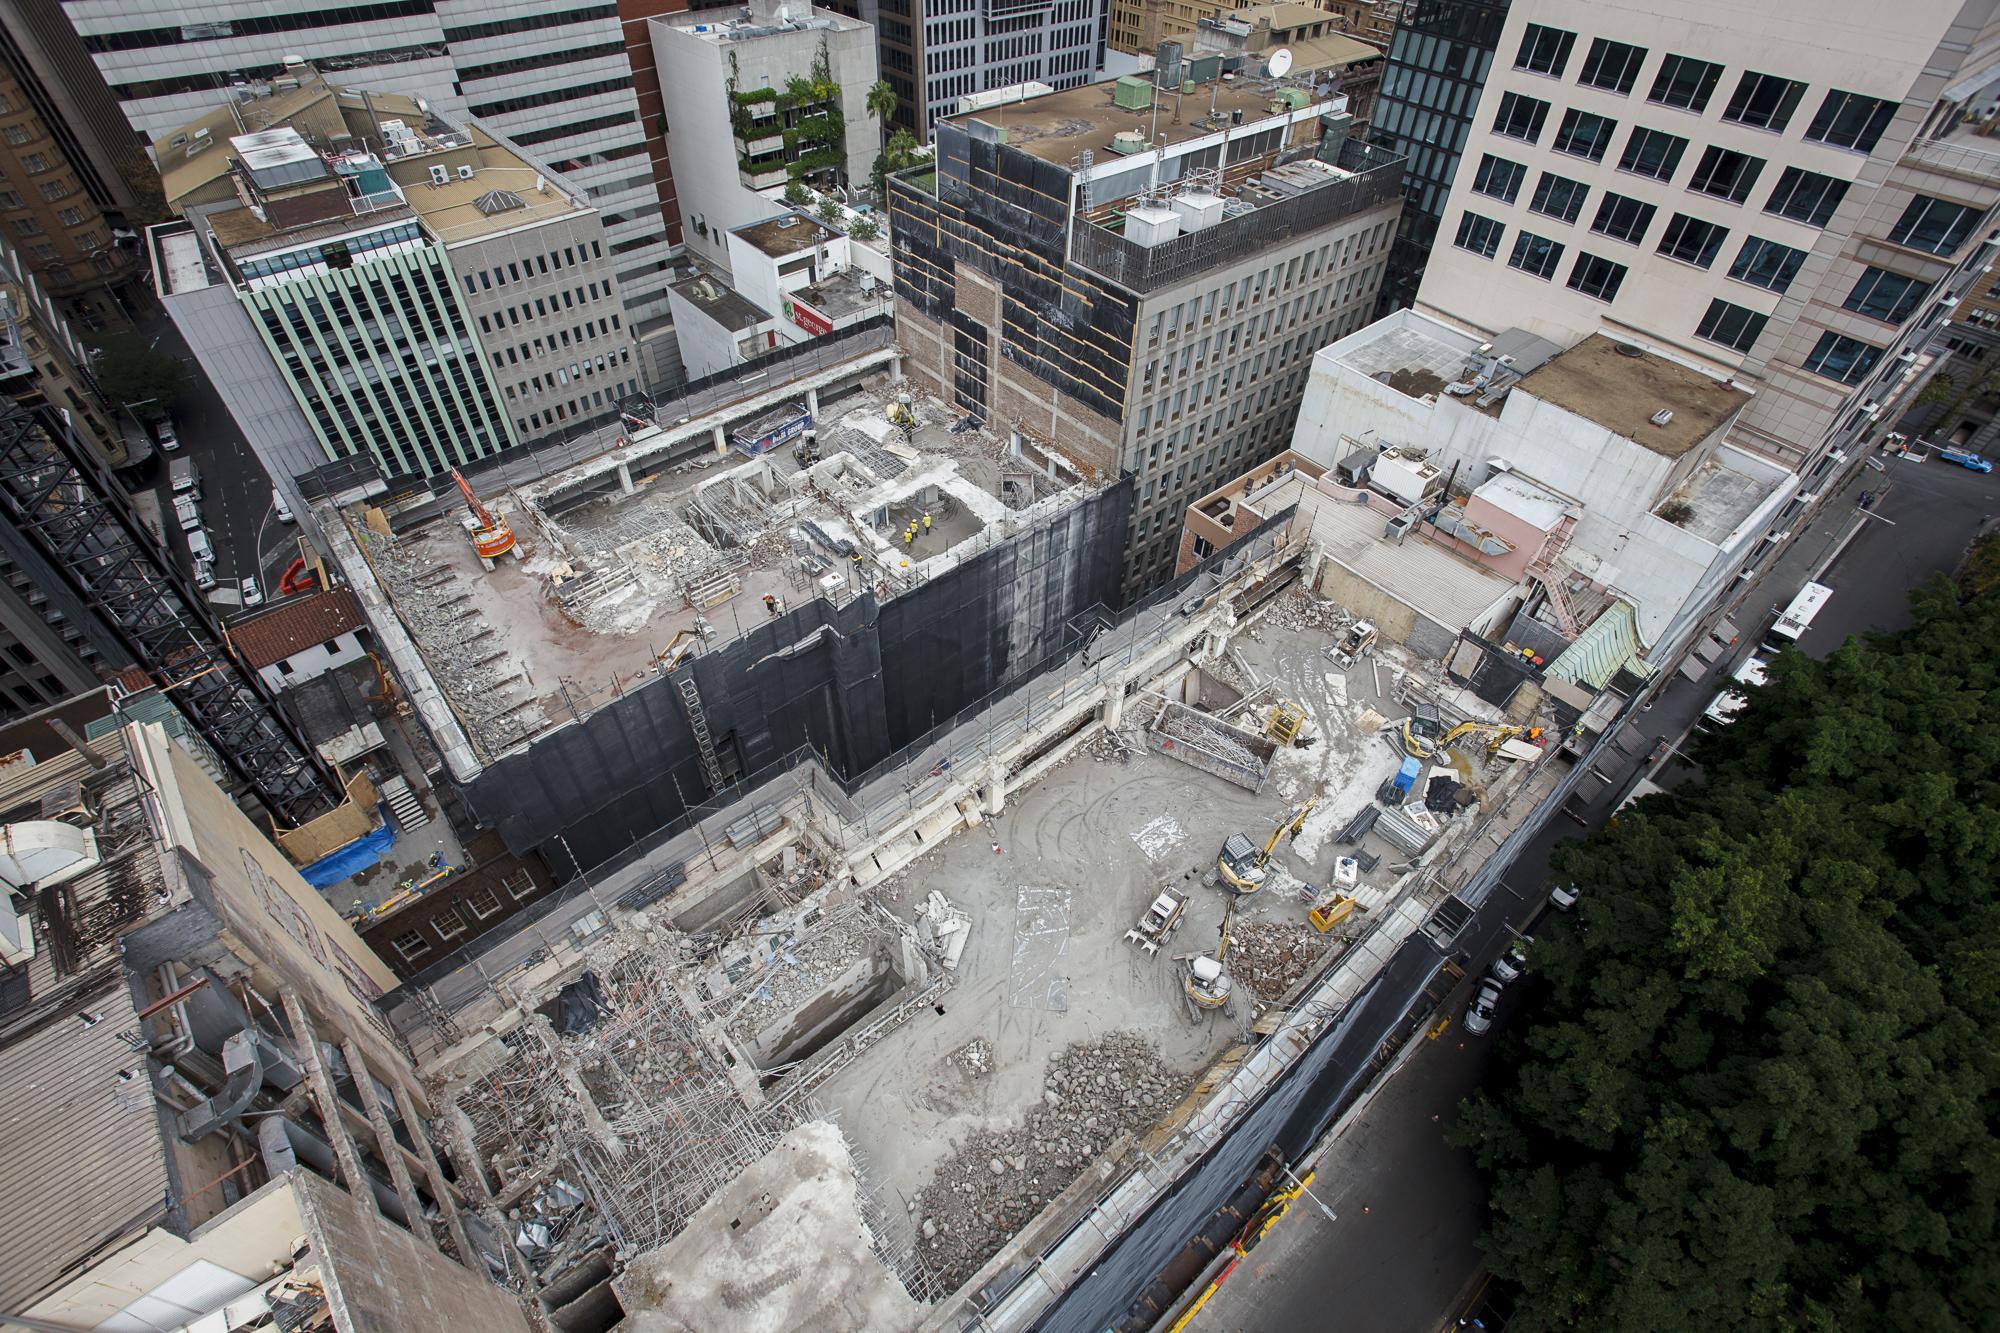 Both Demolition Progress Arieal